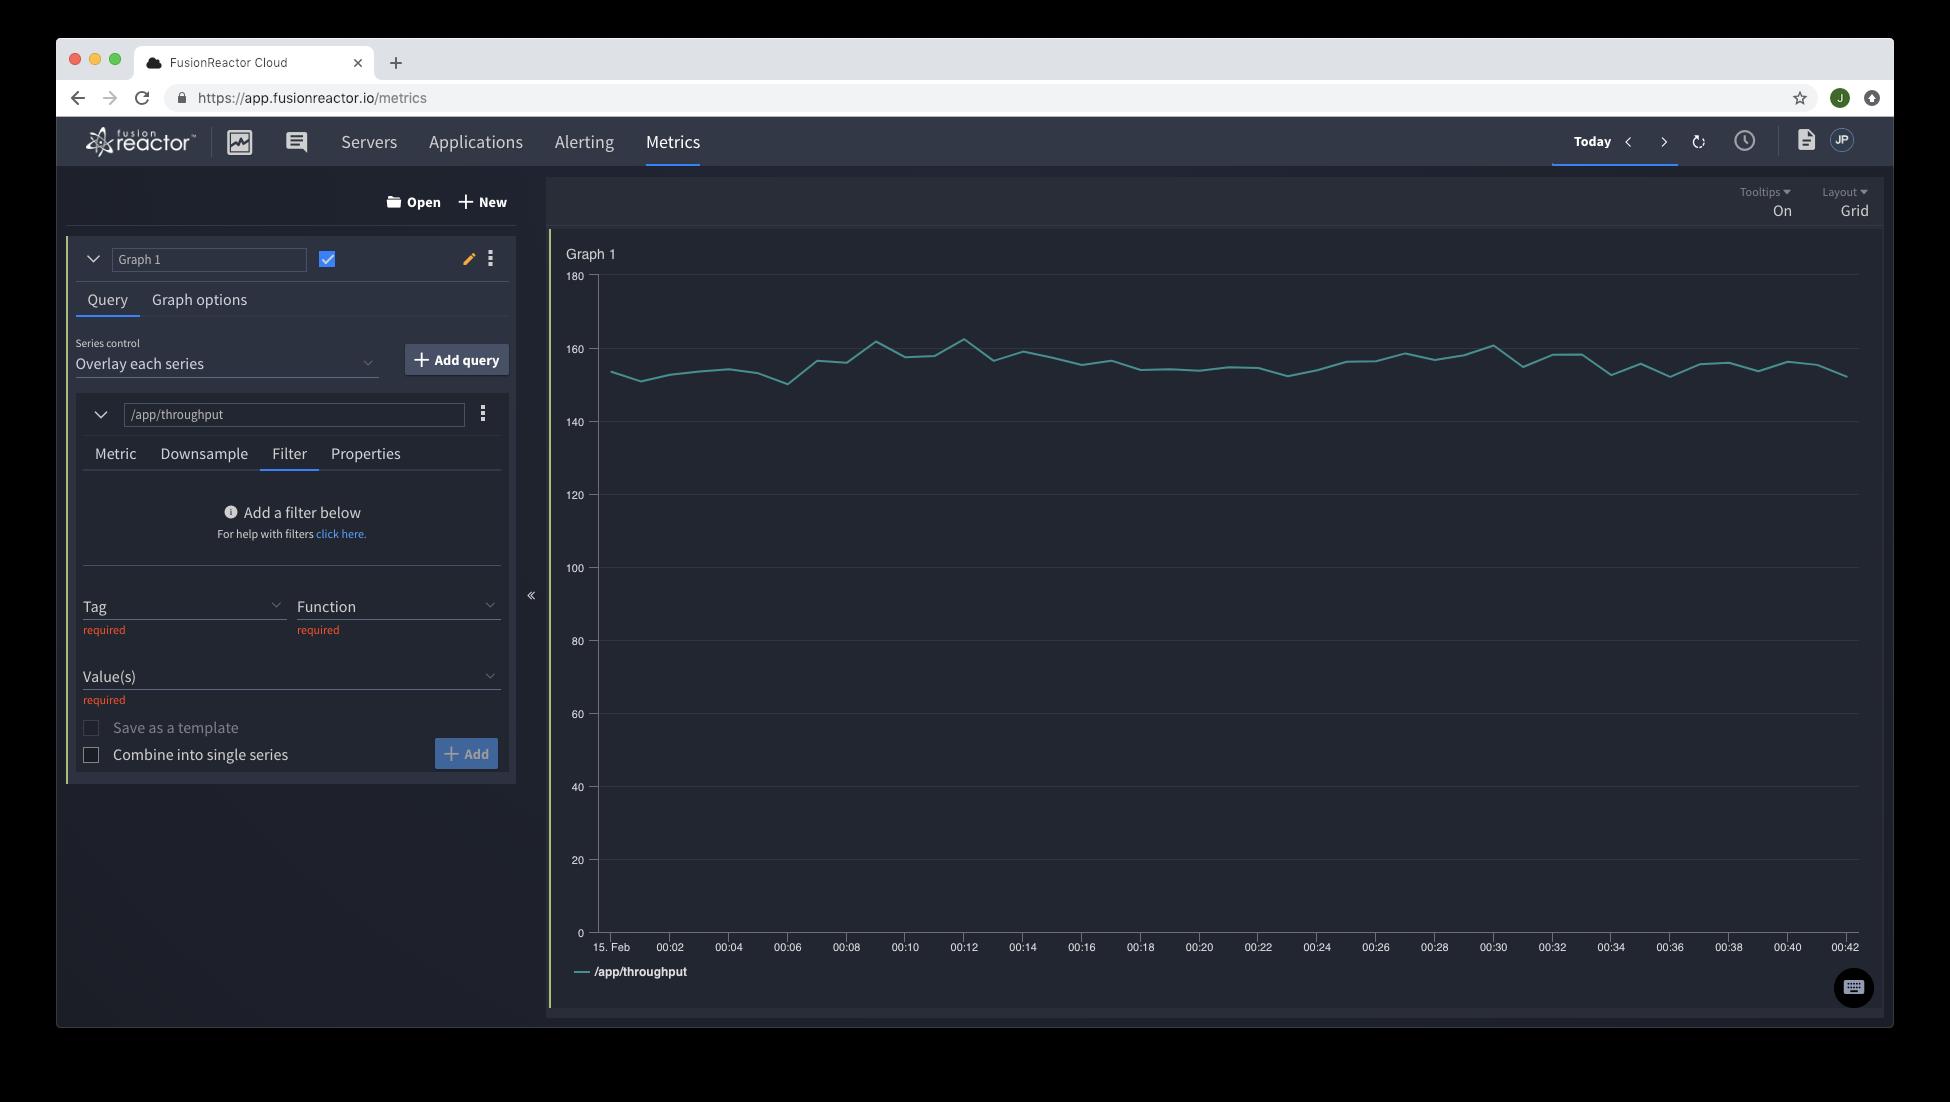 Web Metrics Explorer FusionReactor Hybrid Cloud